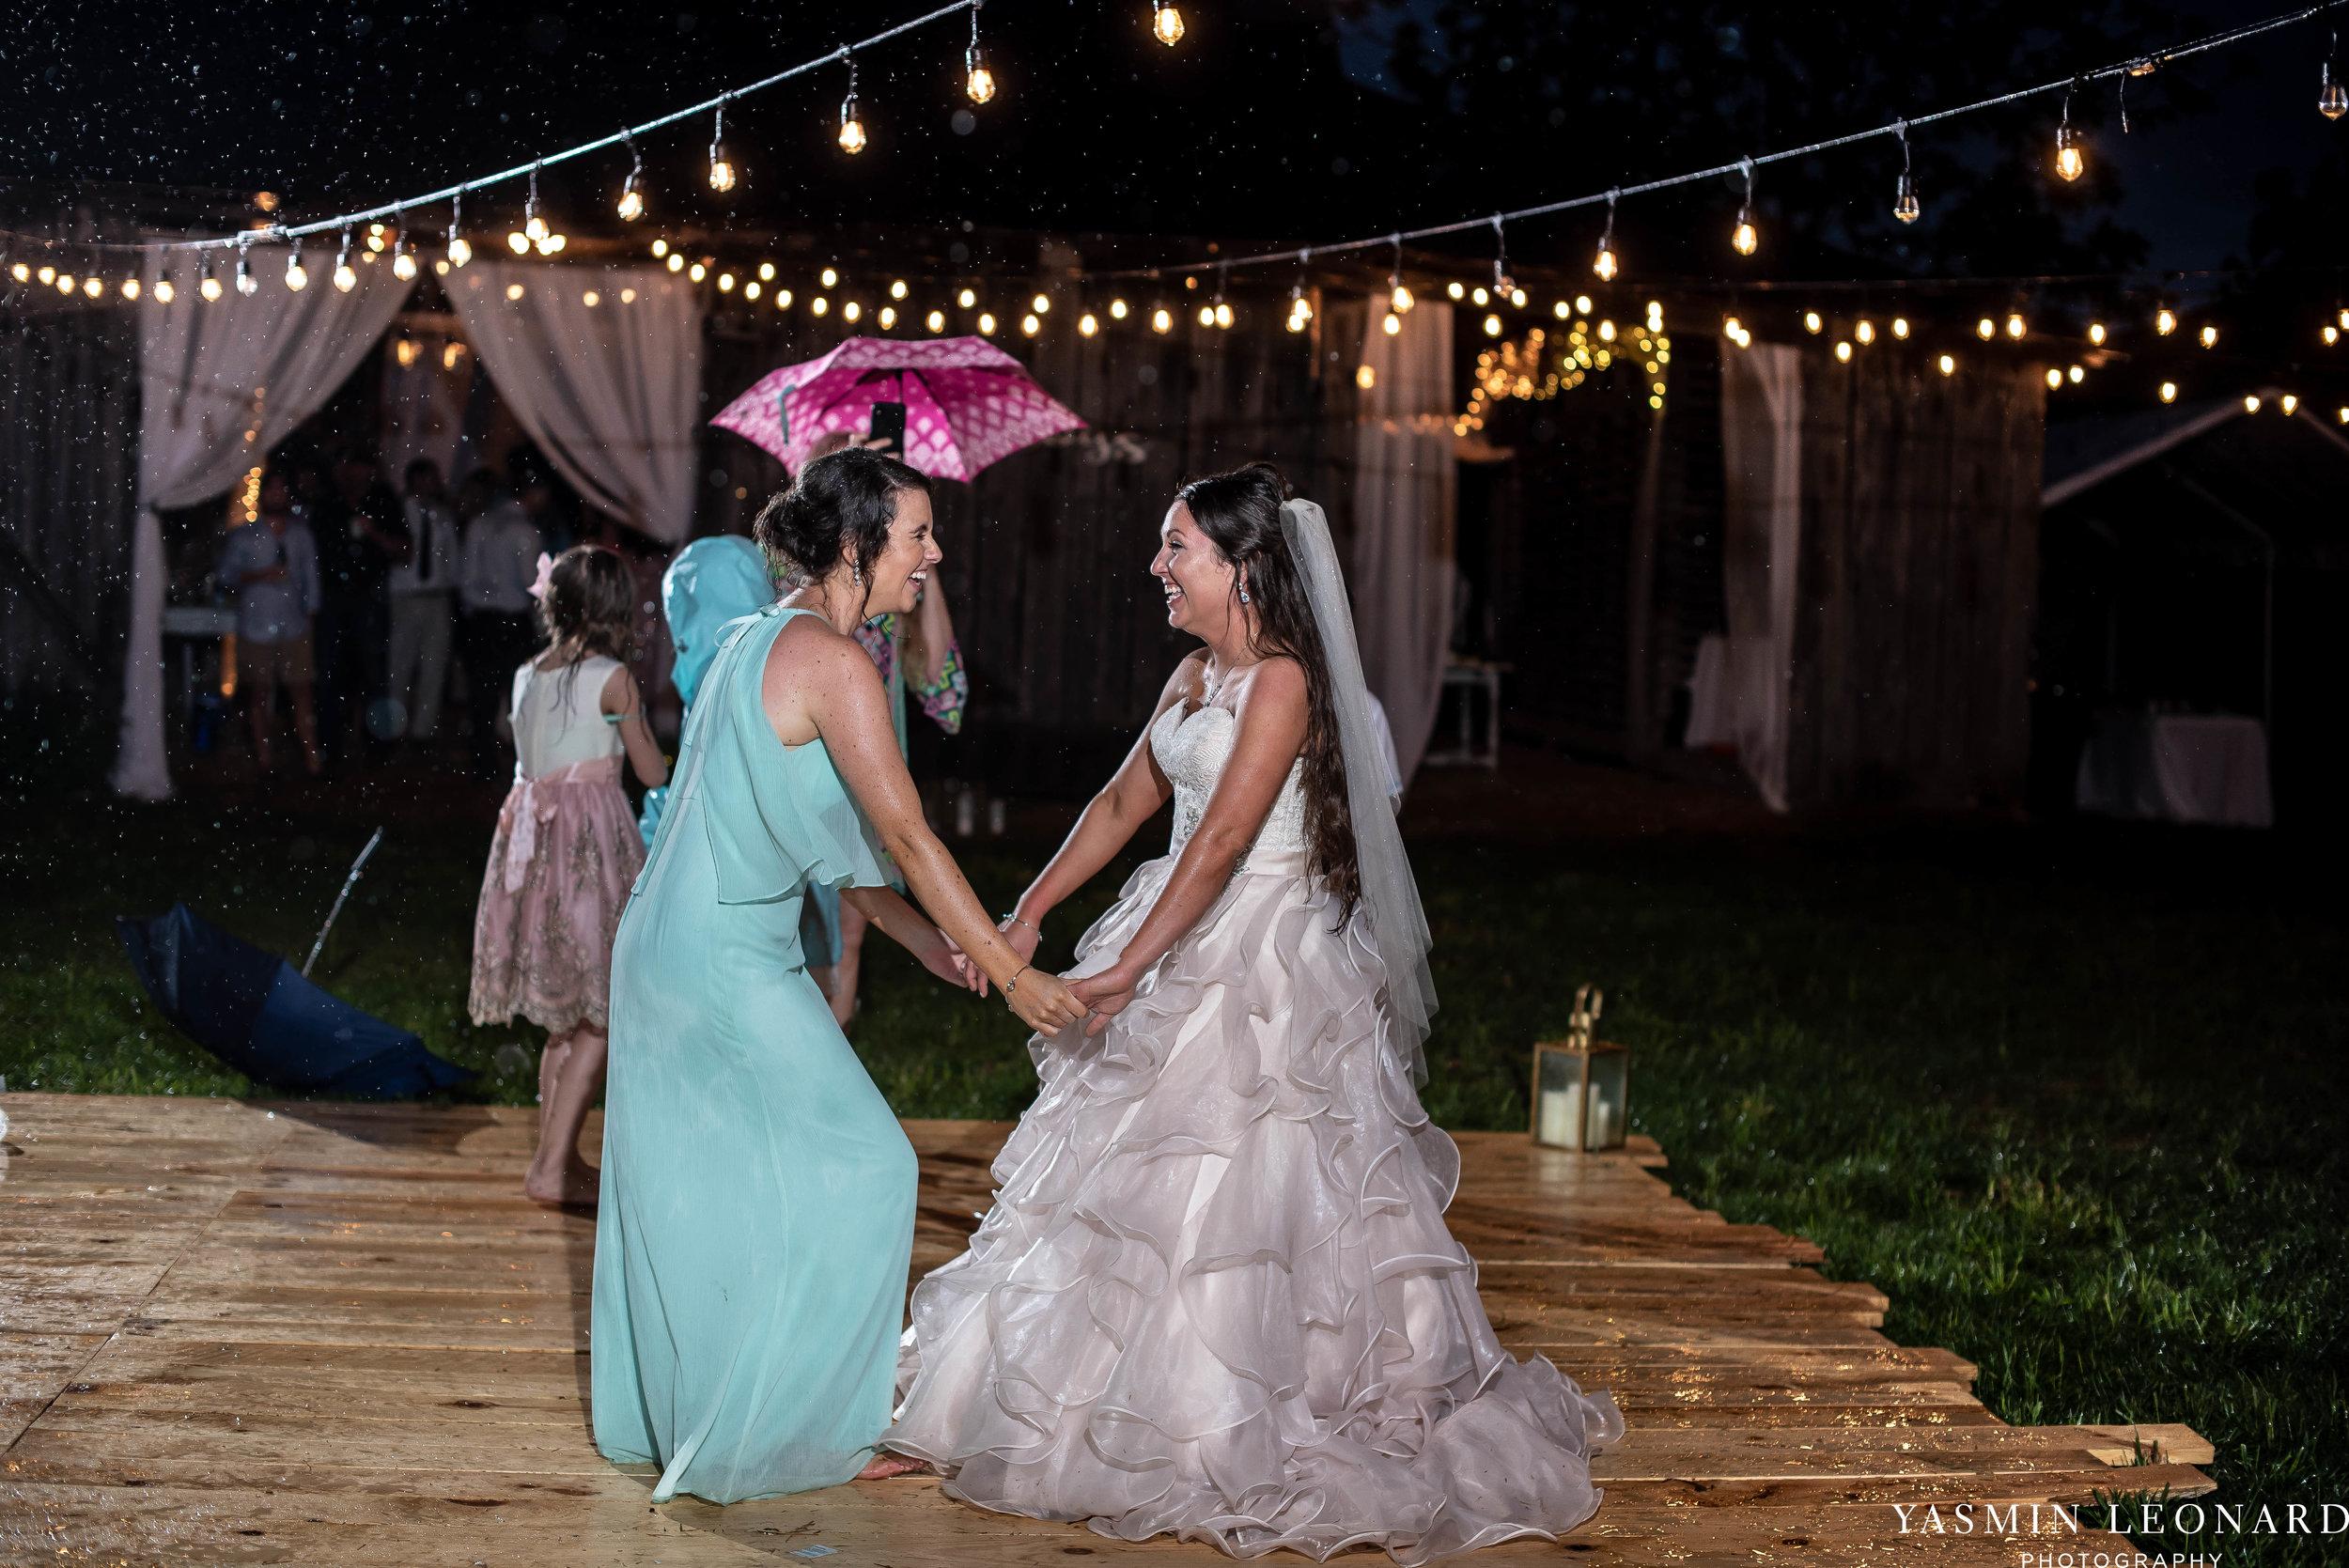 Rain on your wedding day - Rainy Wedding - Plan B for Rain - What to do if it rains on your wedding day - Wedding Inspiration - Outdoor wedding ideas - Rainy Wedding Pictures - Yasmin Leonard Photography-89.jpg